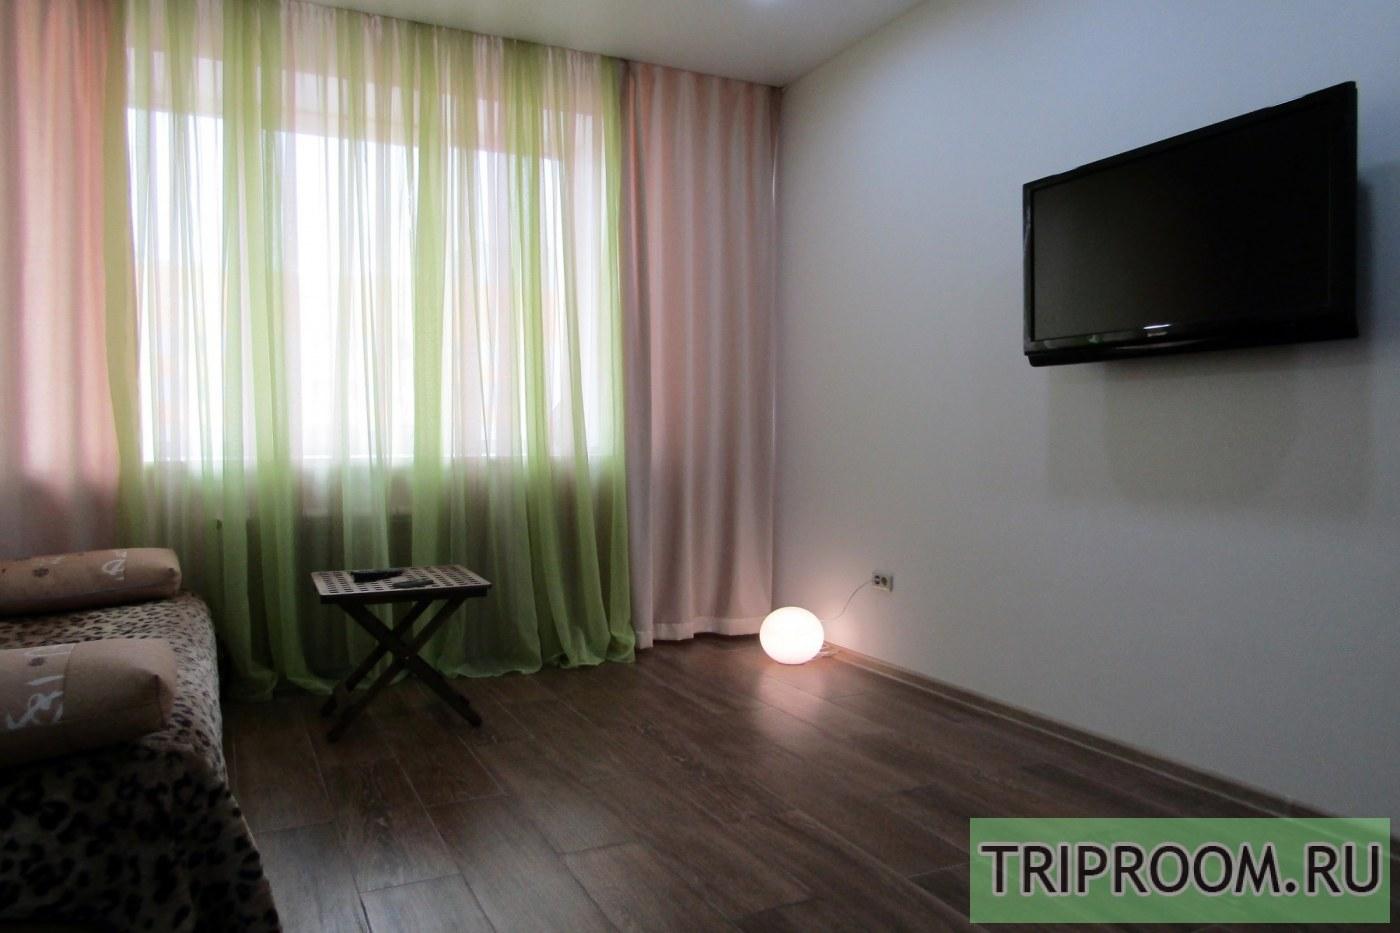 1-комнатная квартира посуточно (вариант № 37389), ул. Лозицкой улица, фото № 2